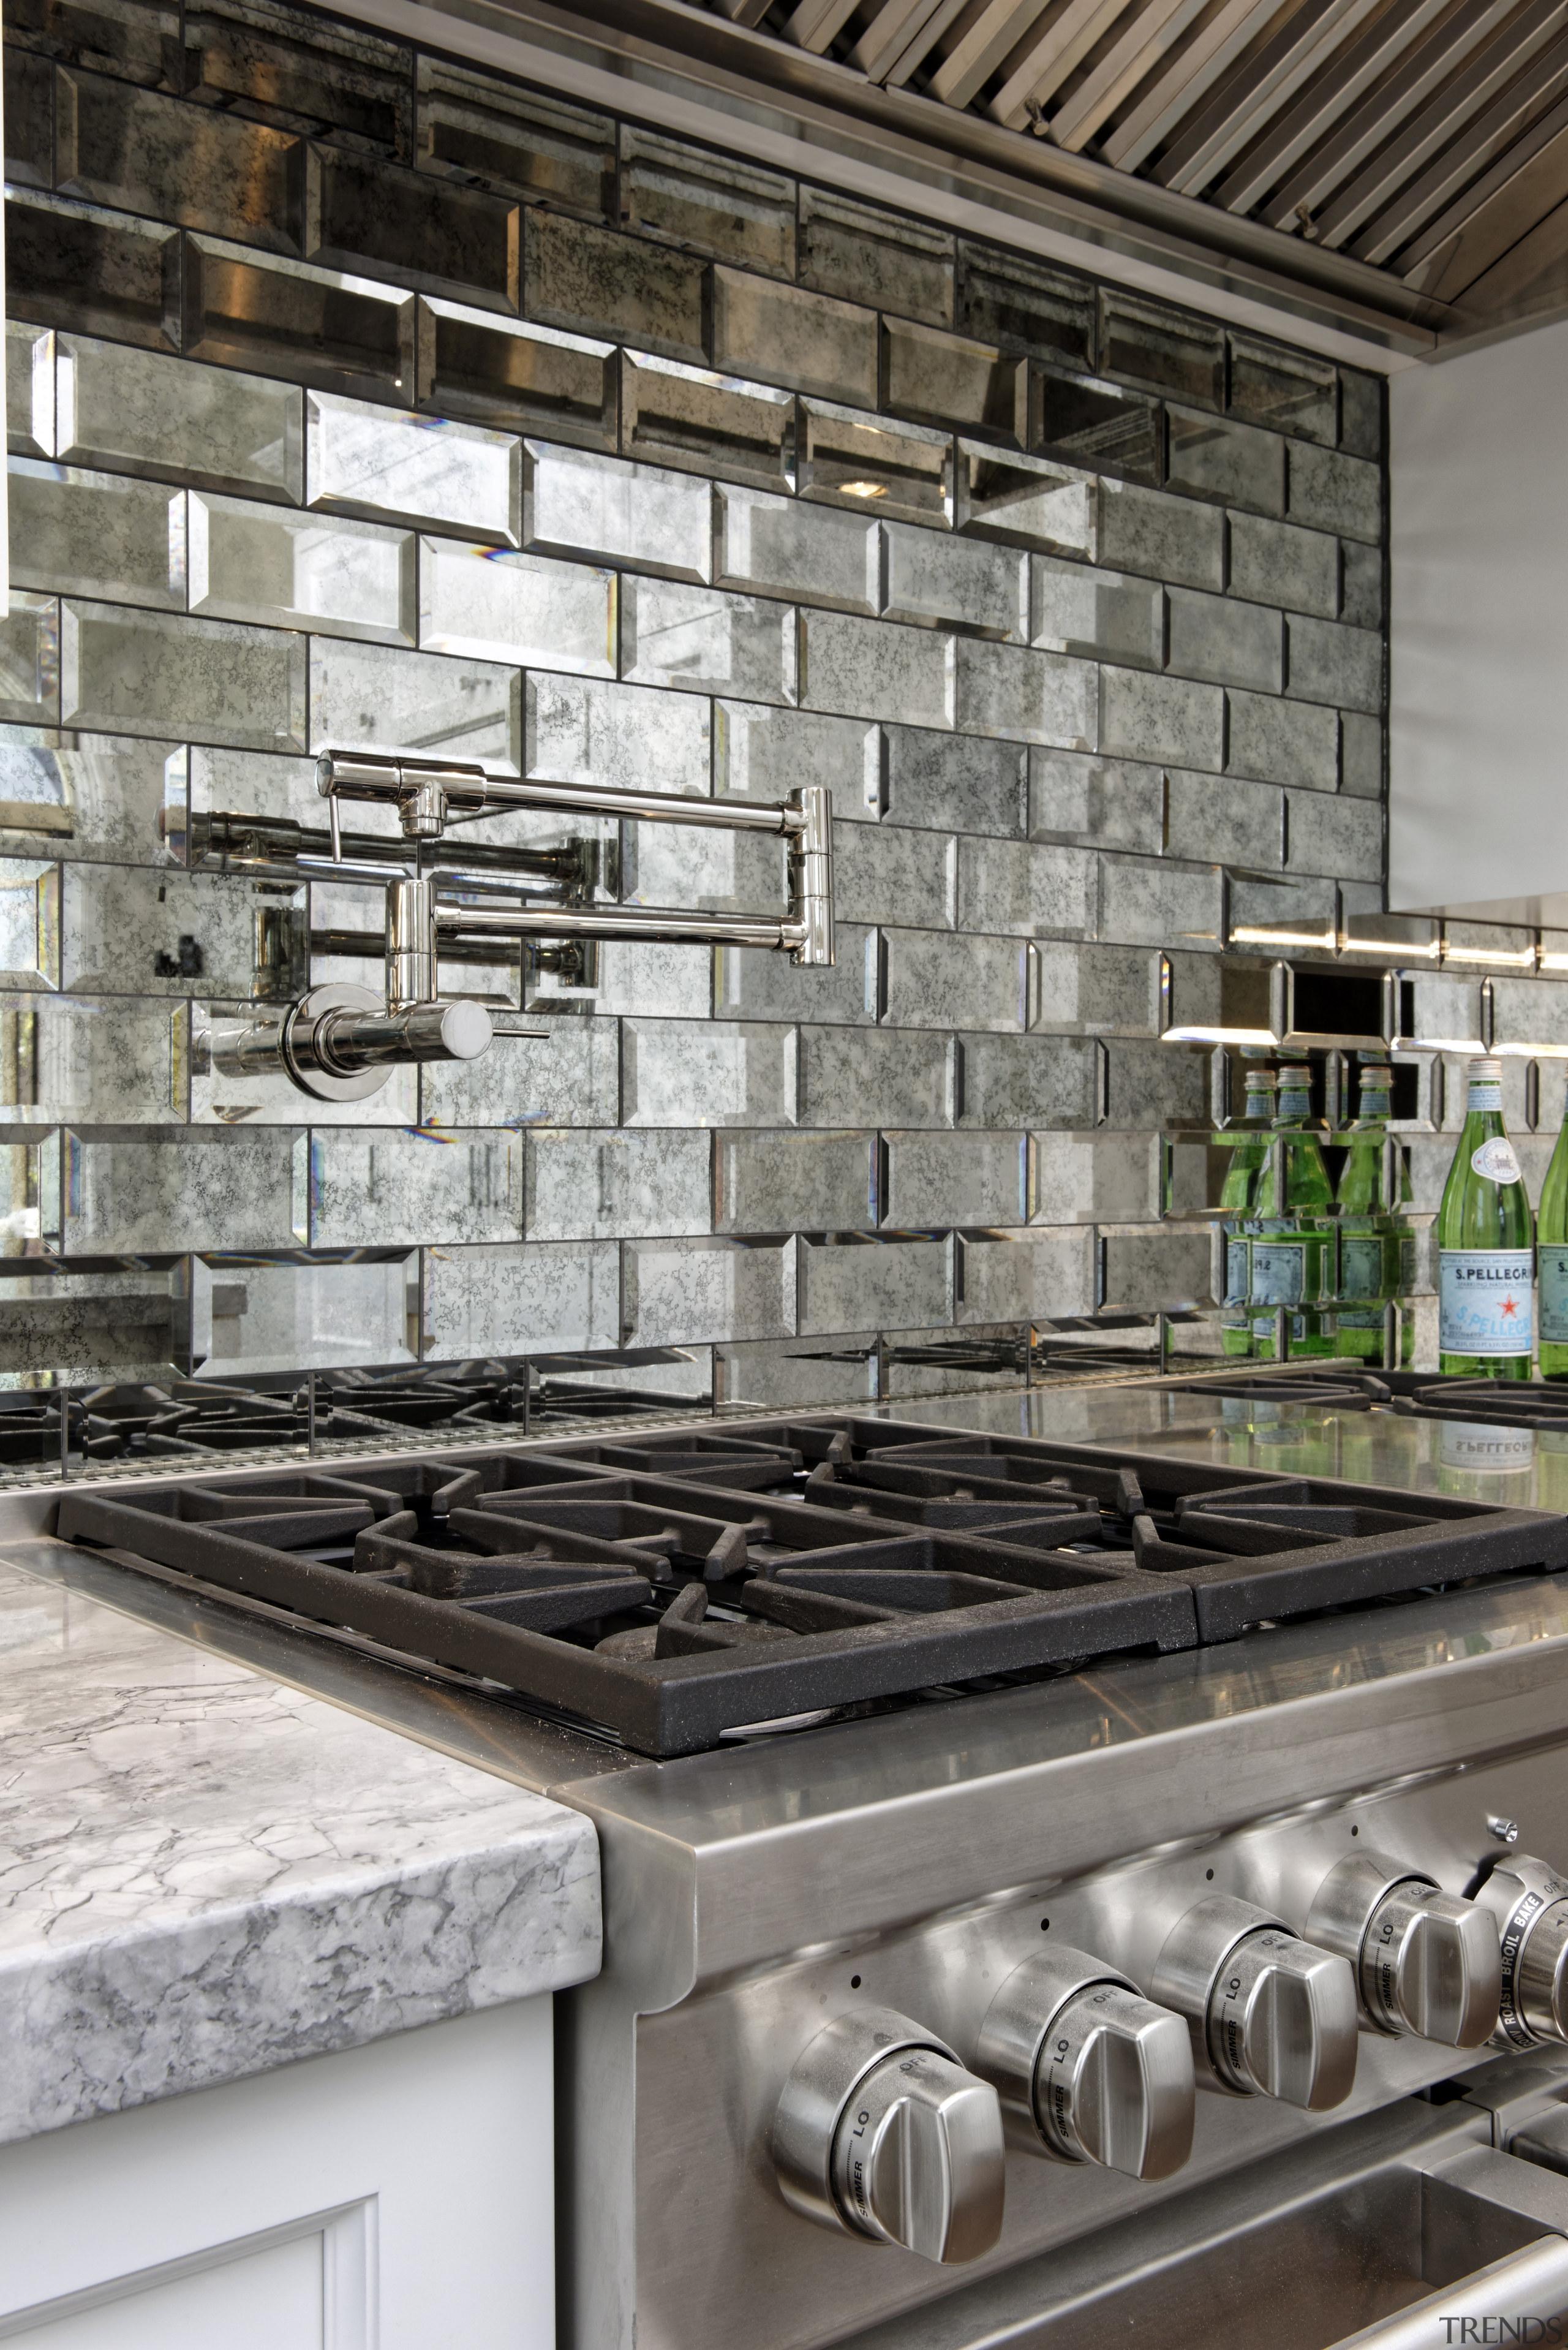 Hefty appliances meet chunky countertops in this upmarket countertop, interior design, tile, wall, gray, black